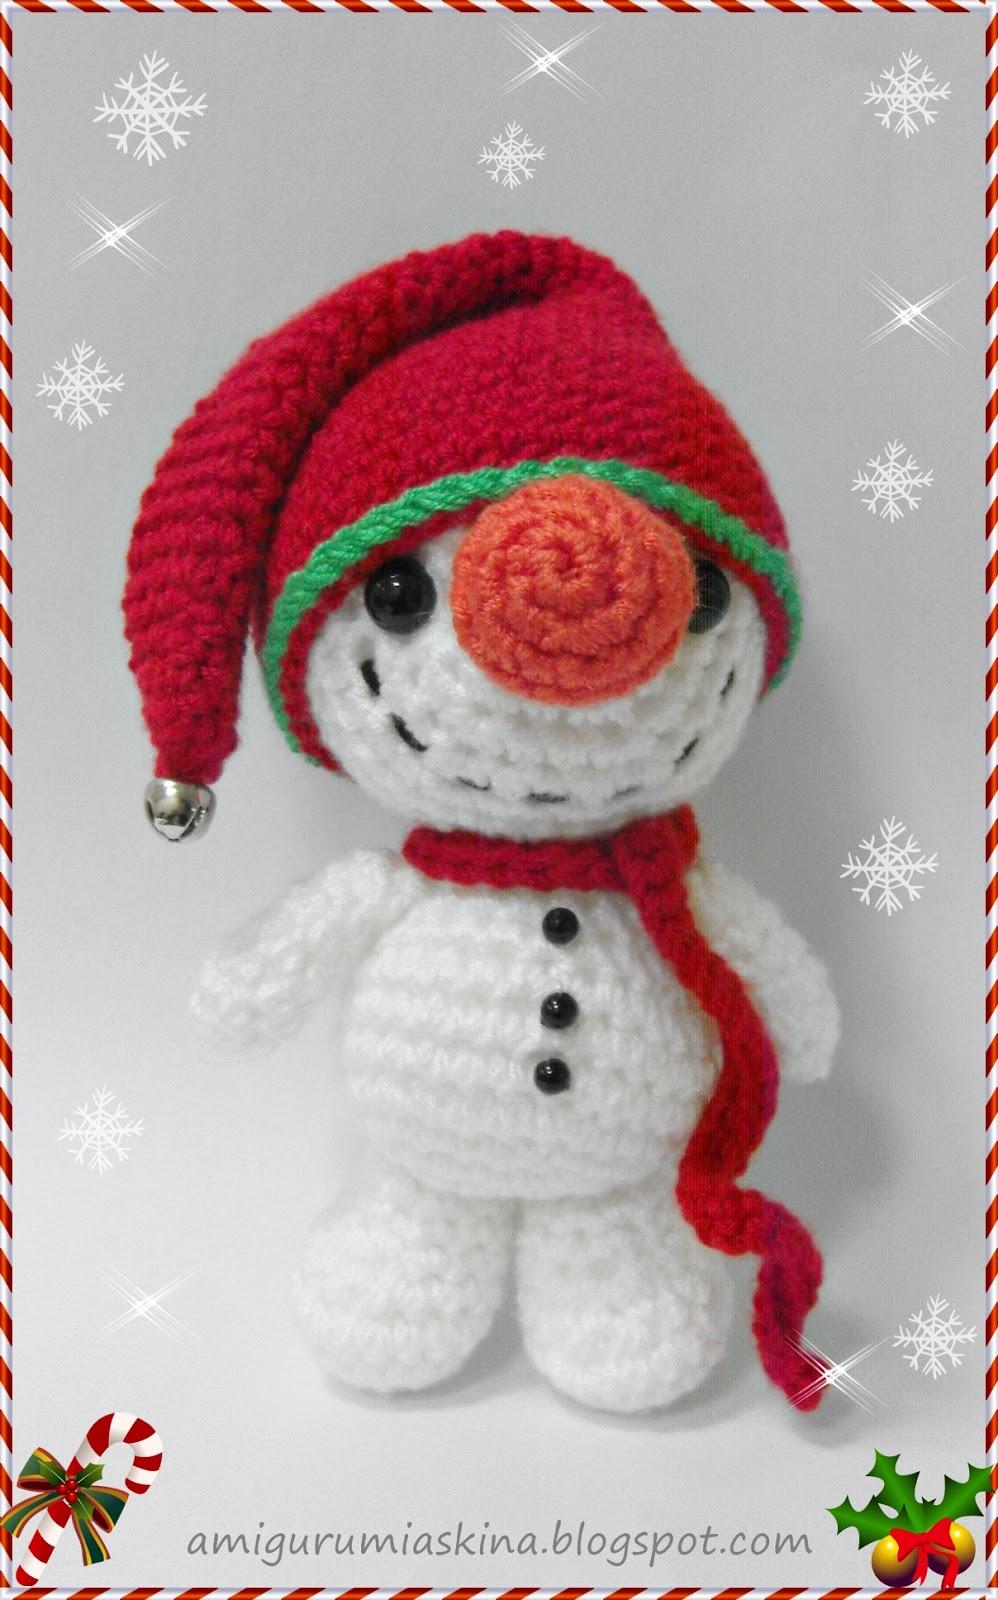 -amigurumi-kucuk-ve-sevimli-kardan-adam-6 Amigurumi Küçük ve Sevimli Kardan Adam